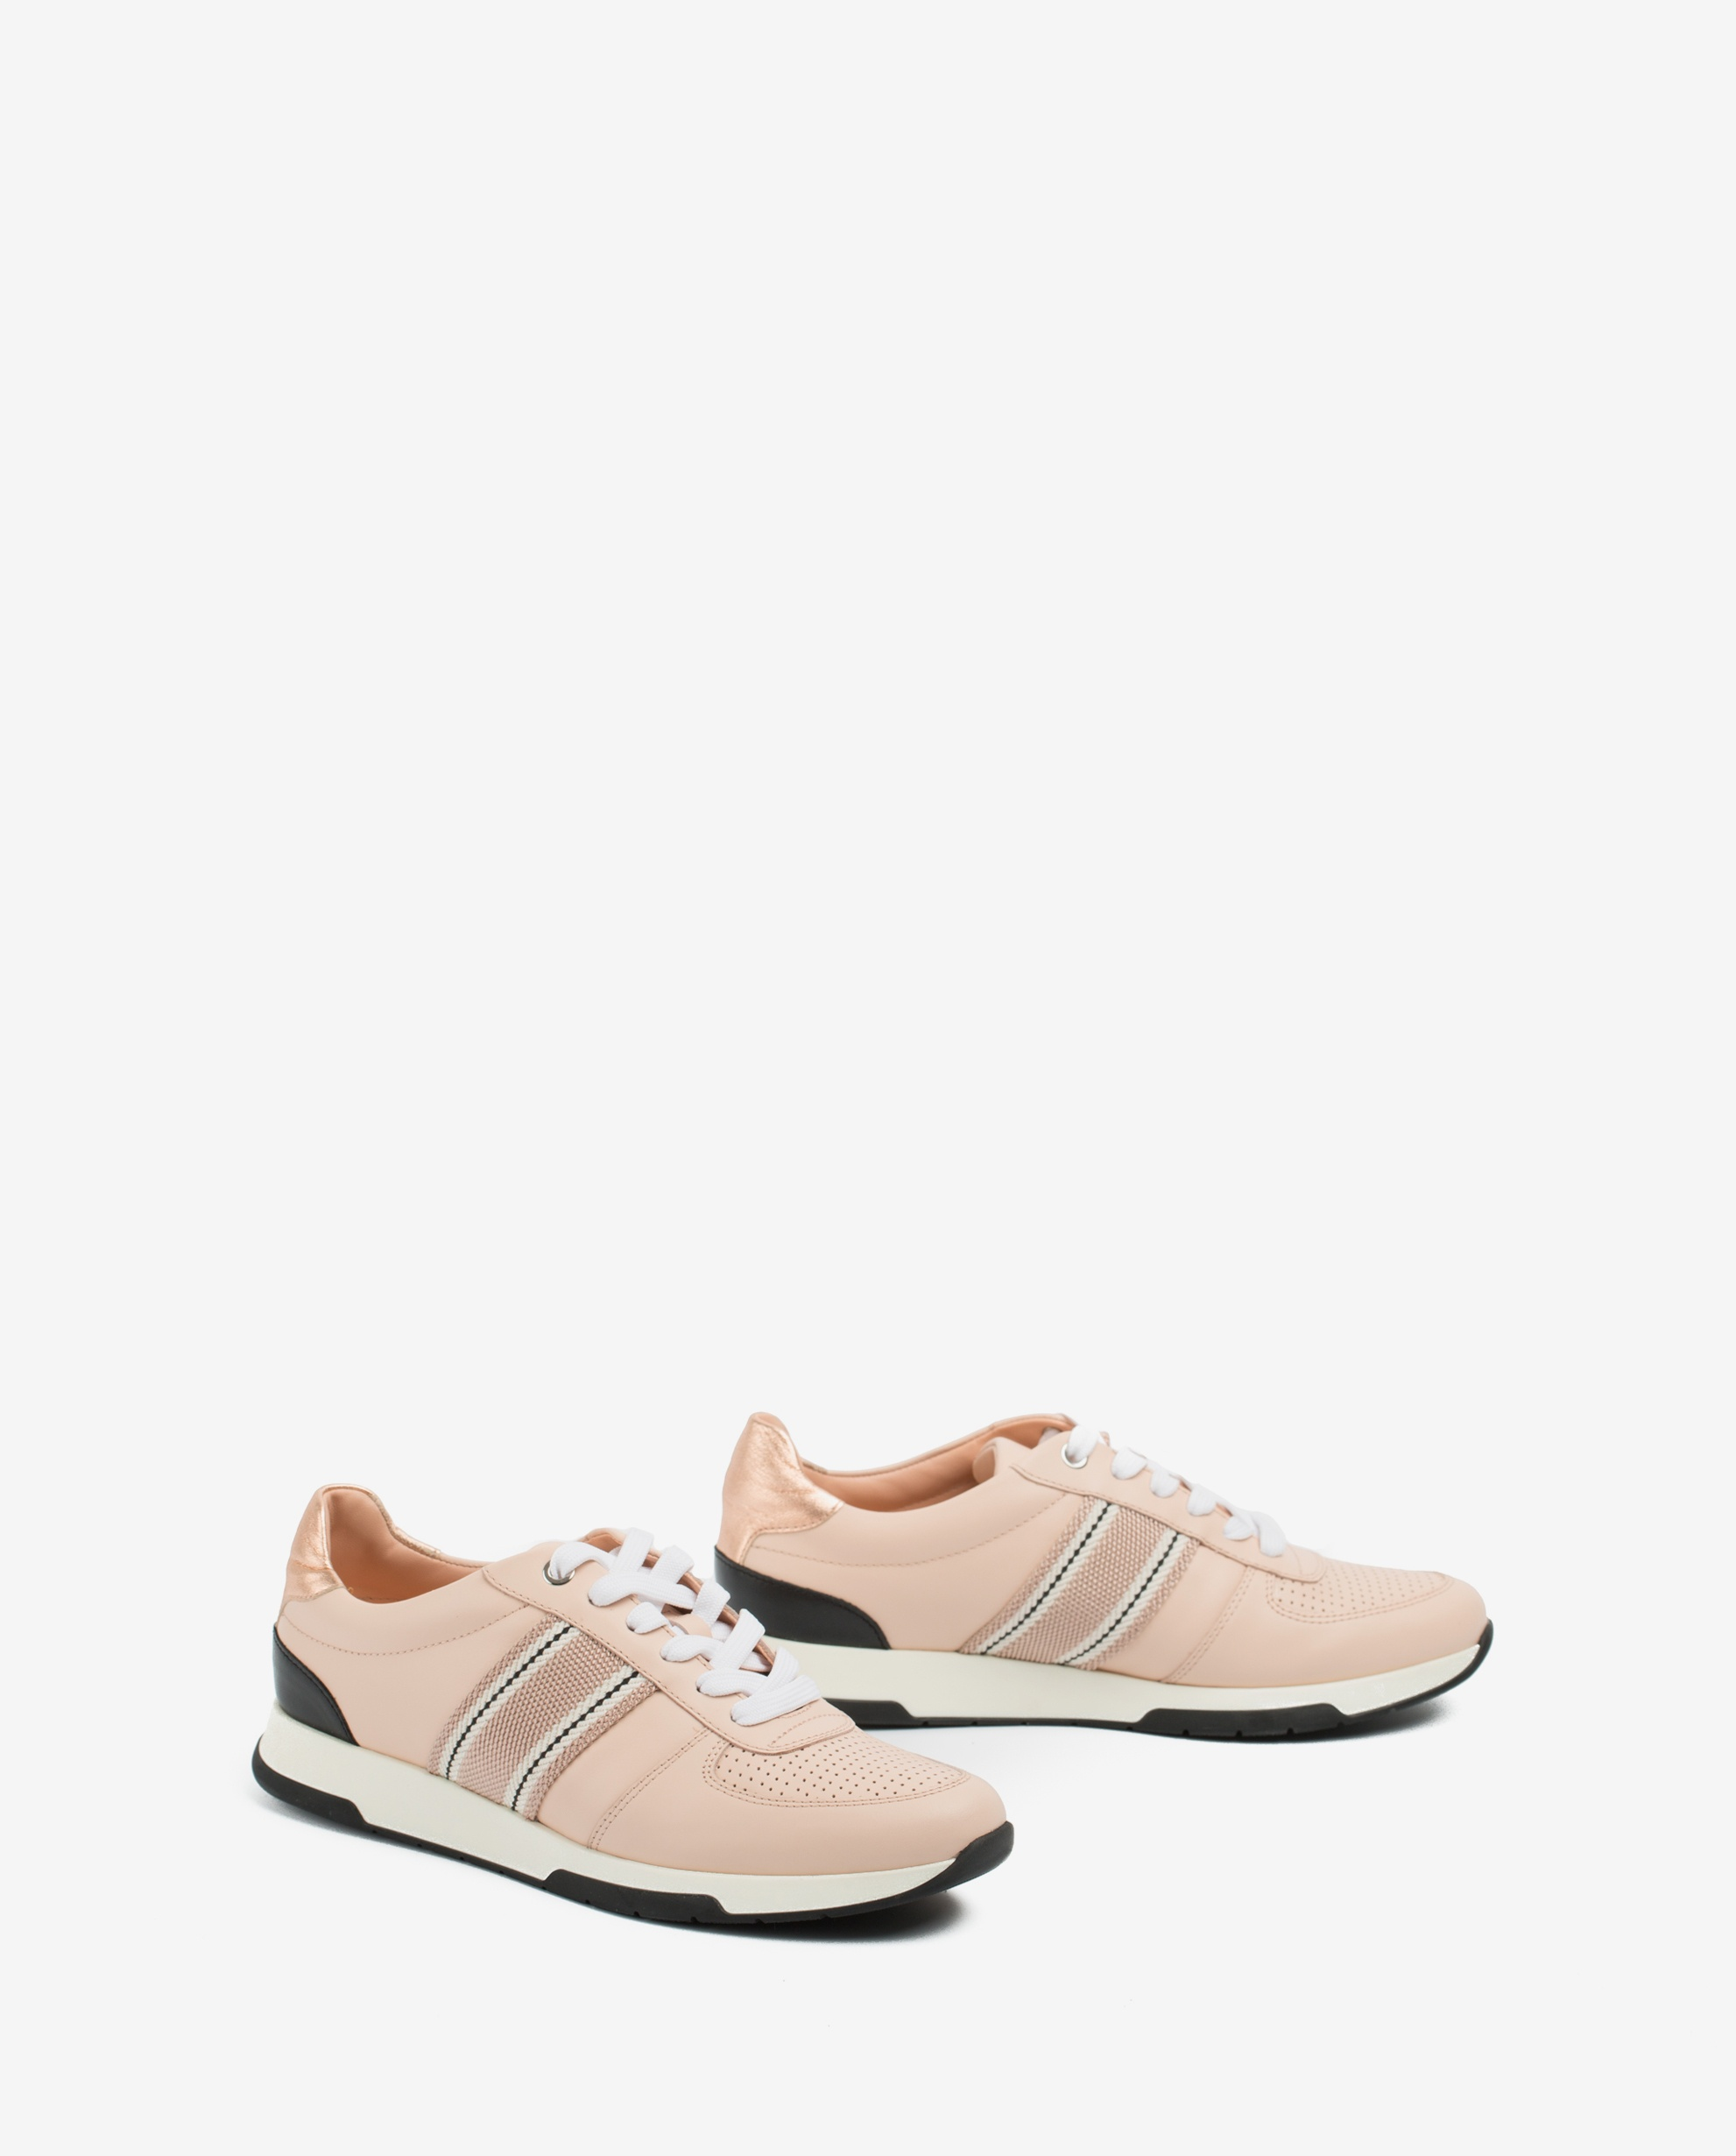 UNISA Chaussures de sport décoration tissu FARIDA_NF pale/rosa 3